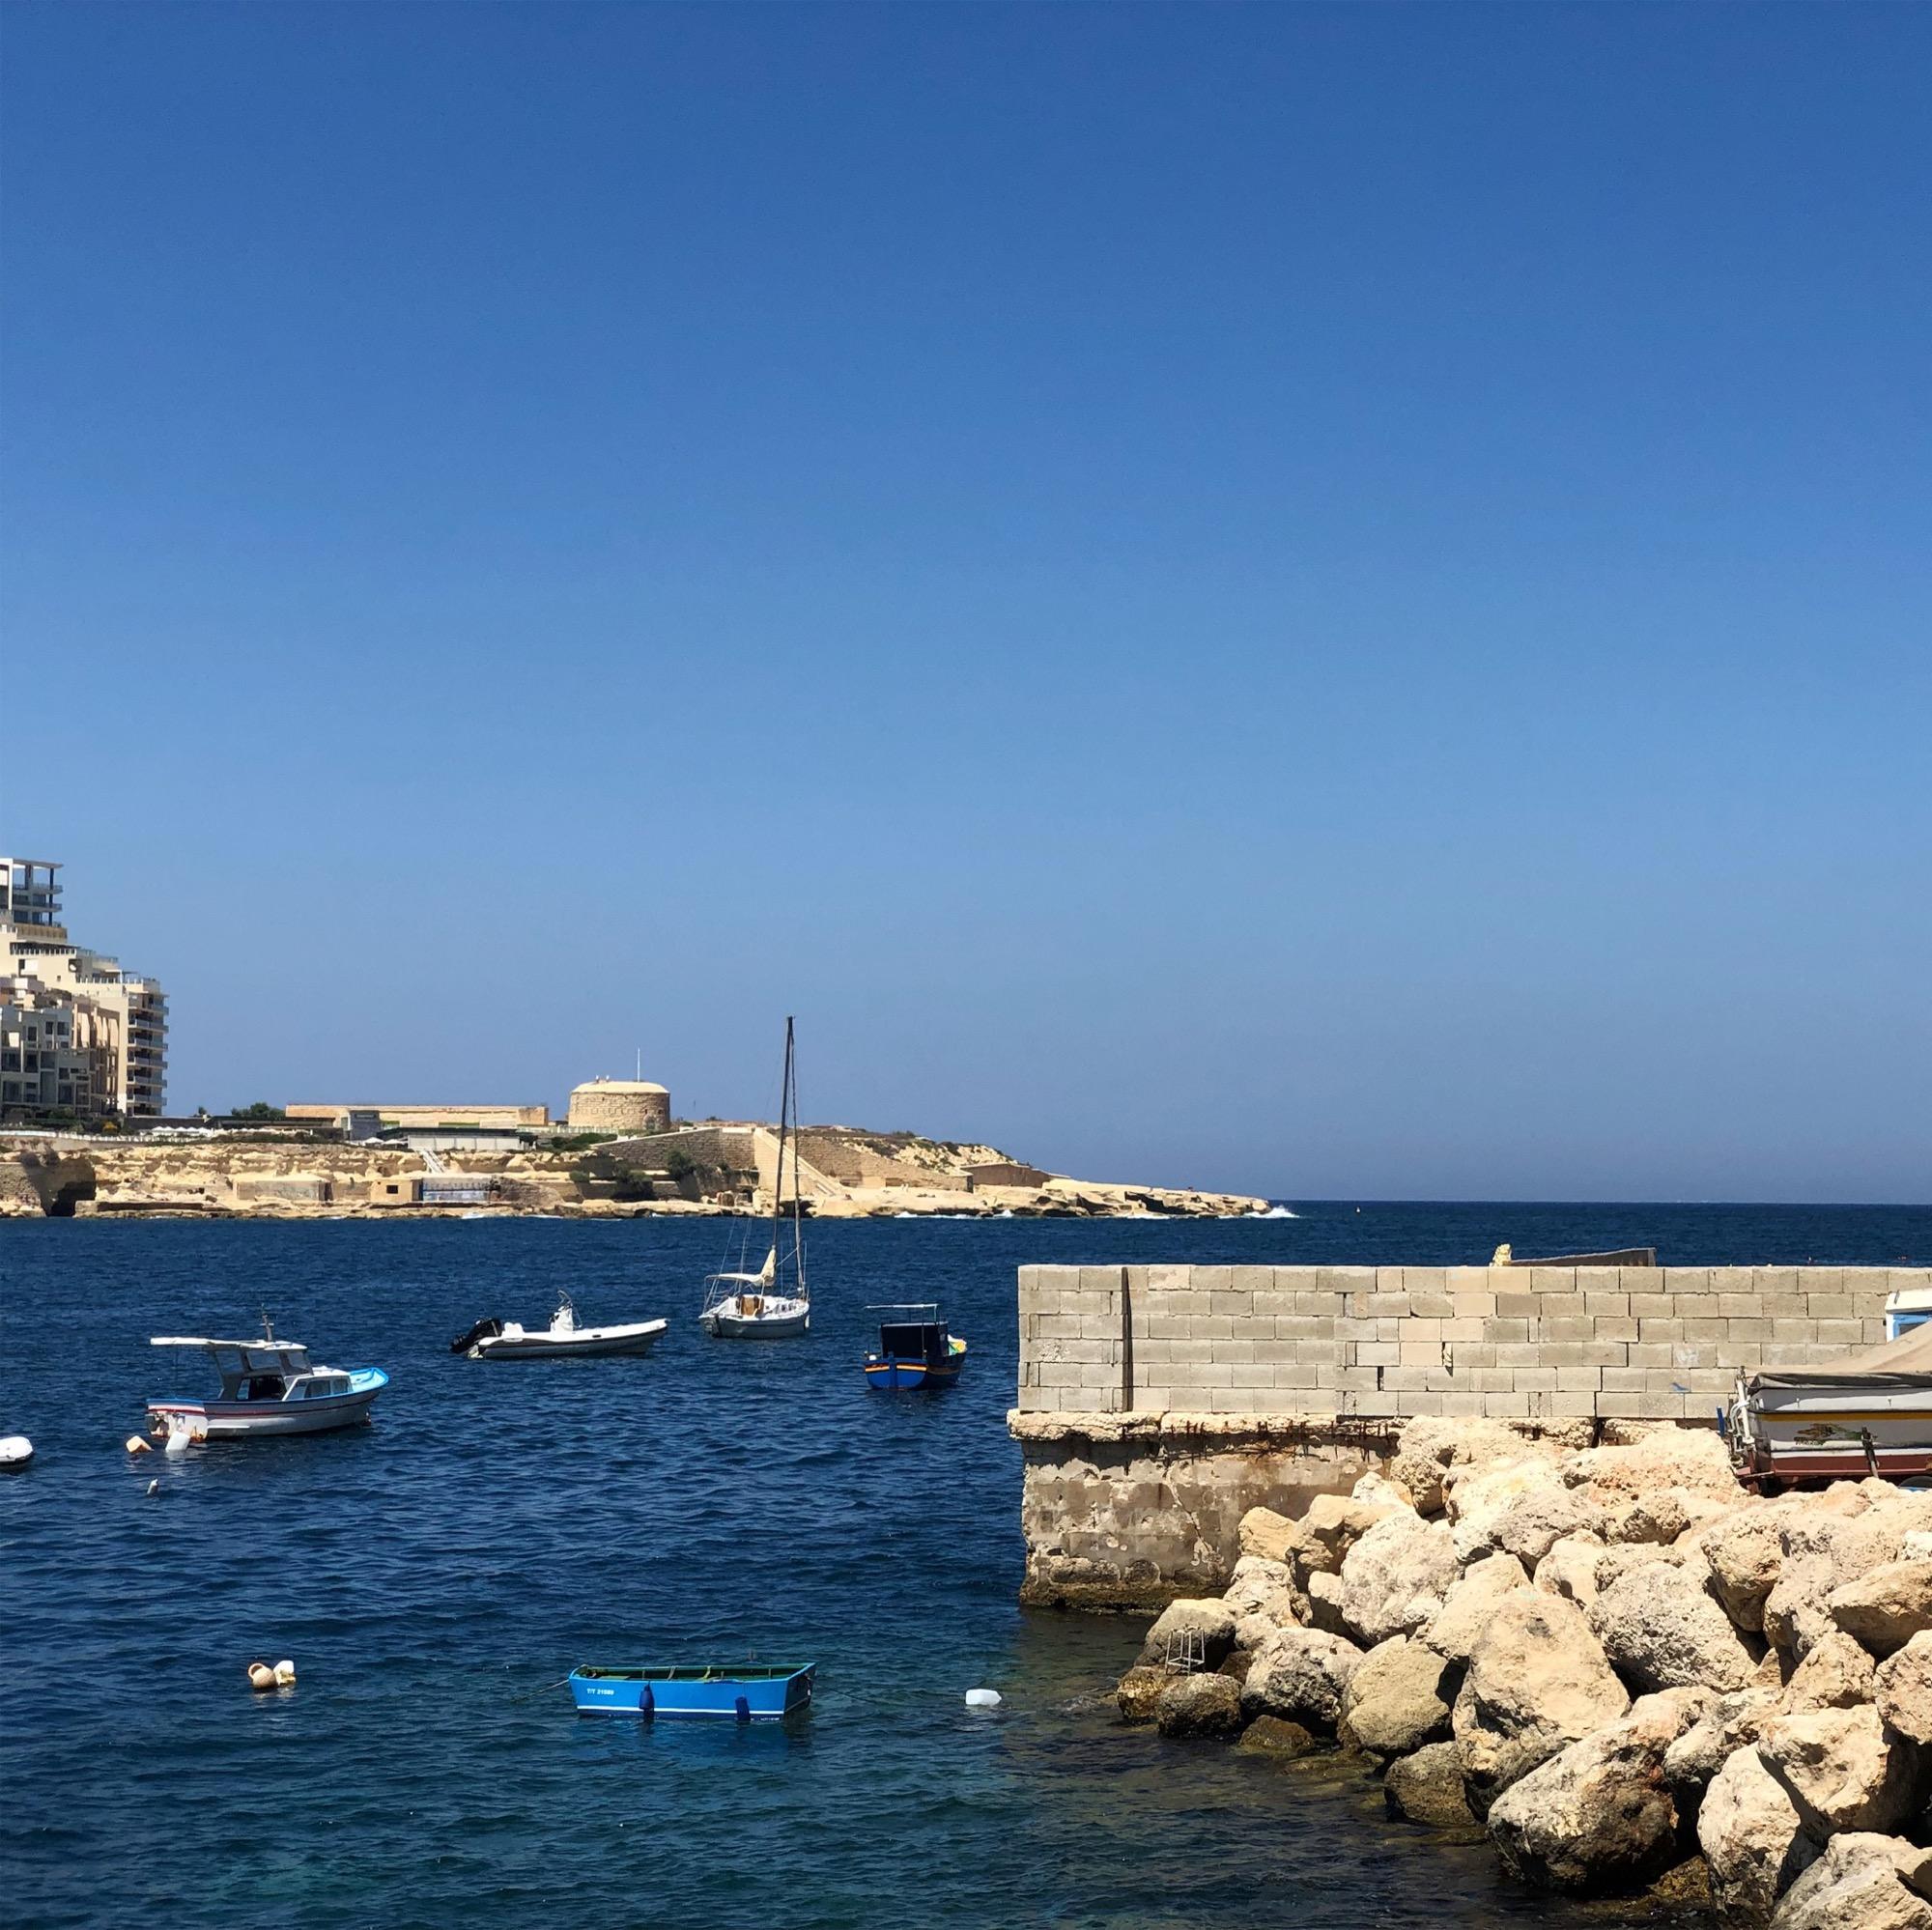 Malta 17:7:19 by Ross Farley.jpeg